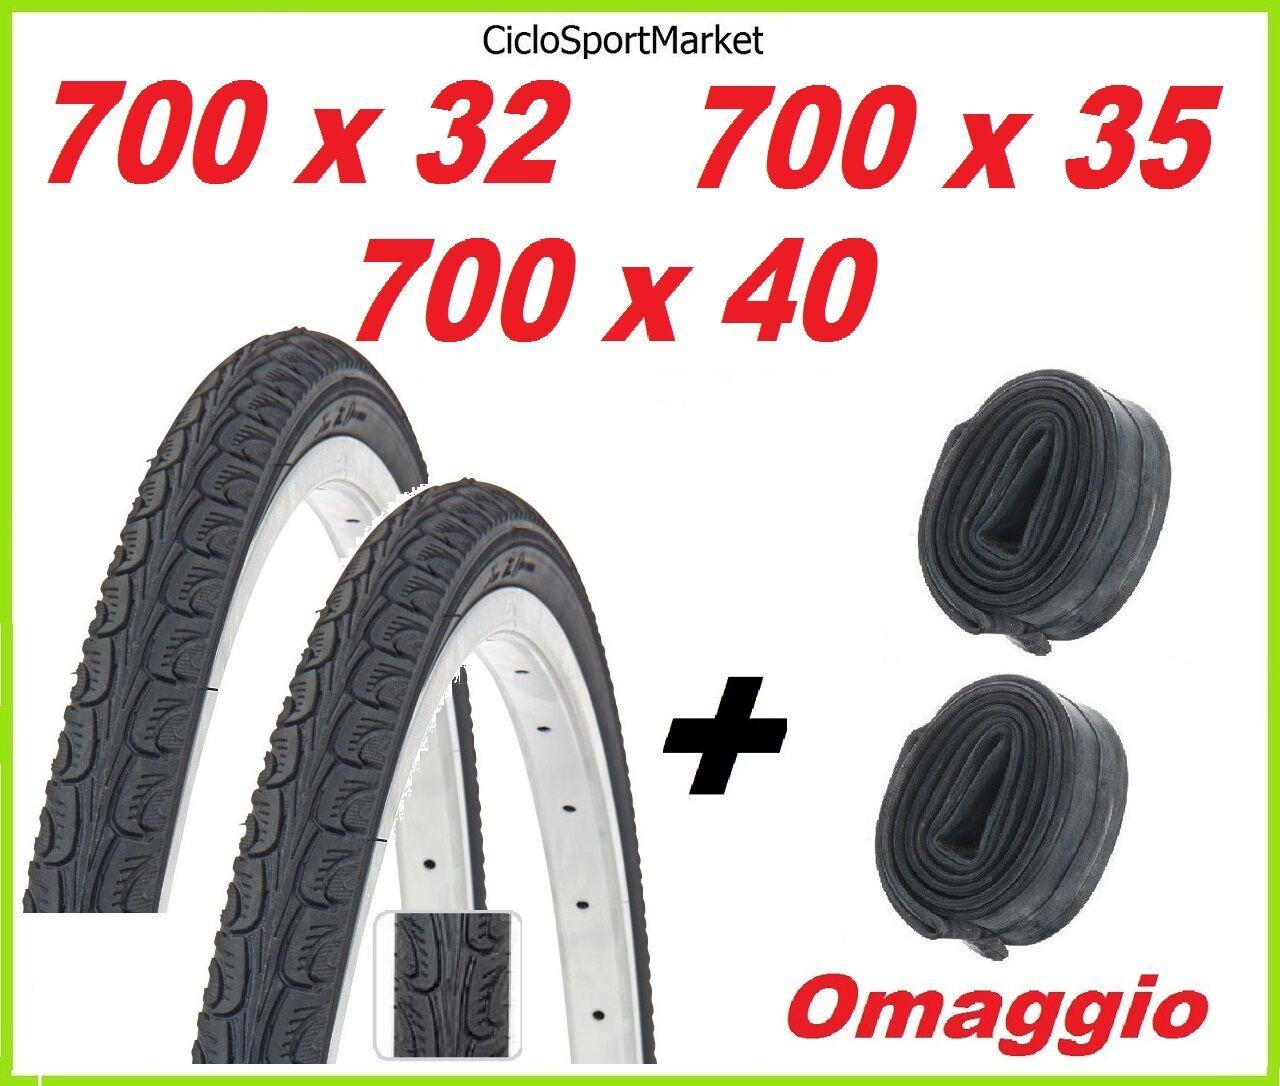 2 x Tyre 700 x 32 - 700 x 35 - 700 x 40 bicycle + 2 x INNER TUBE